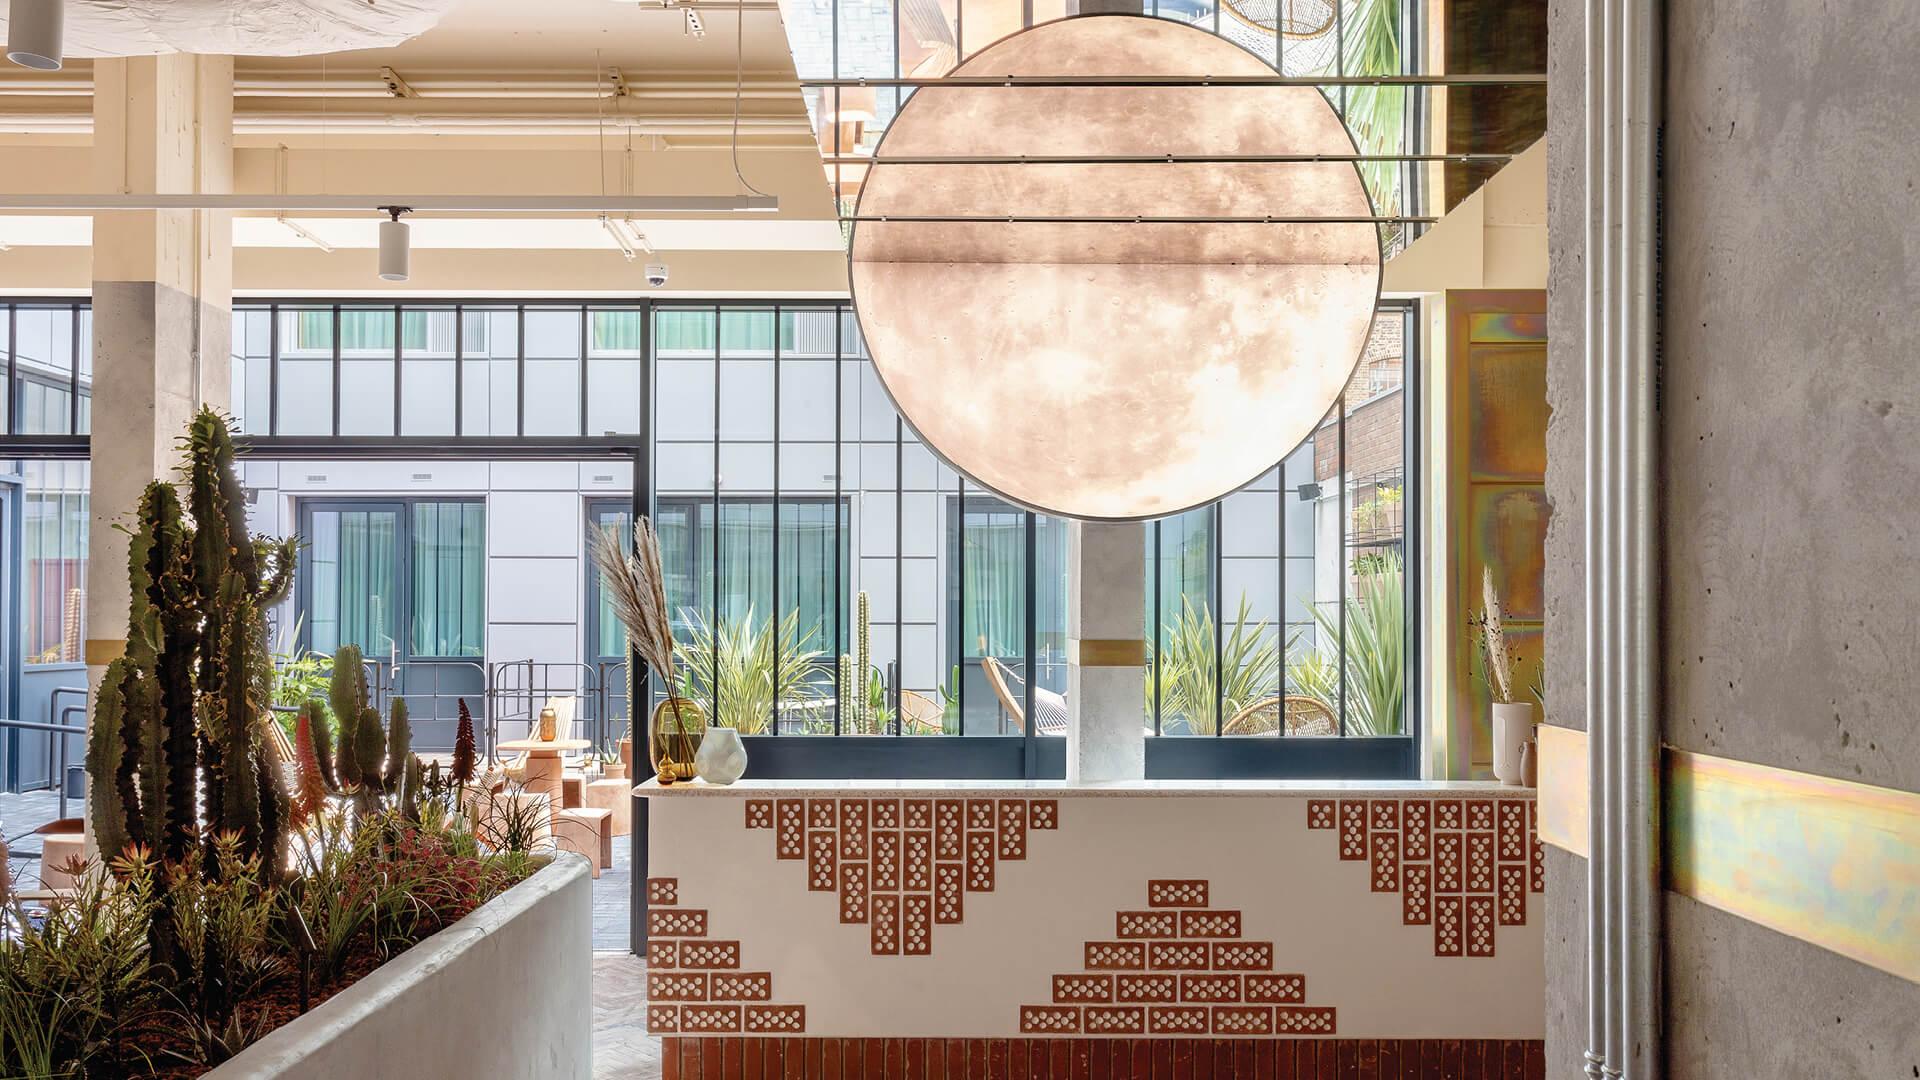 Inside the Californian desert inspired interiors of Bermonds Locke apartment hotel   Bermonds Locke Hotel by Holloway Li   STIRworld